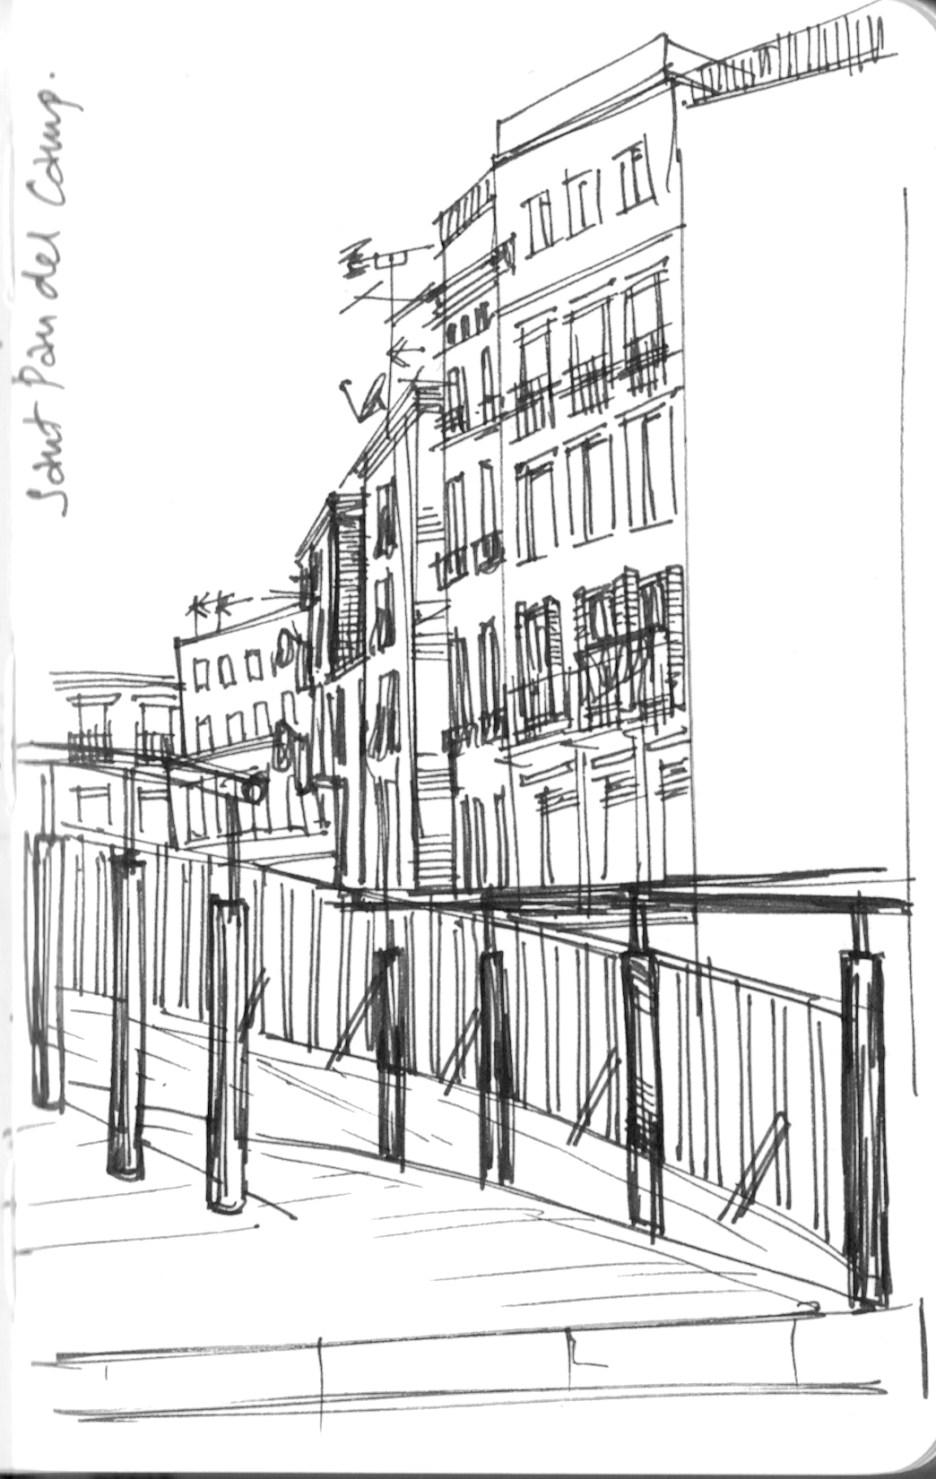 barcelona_sketch_01